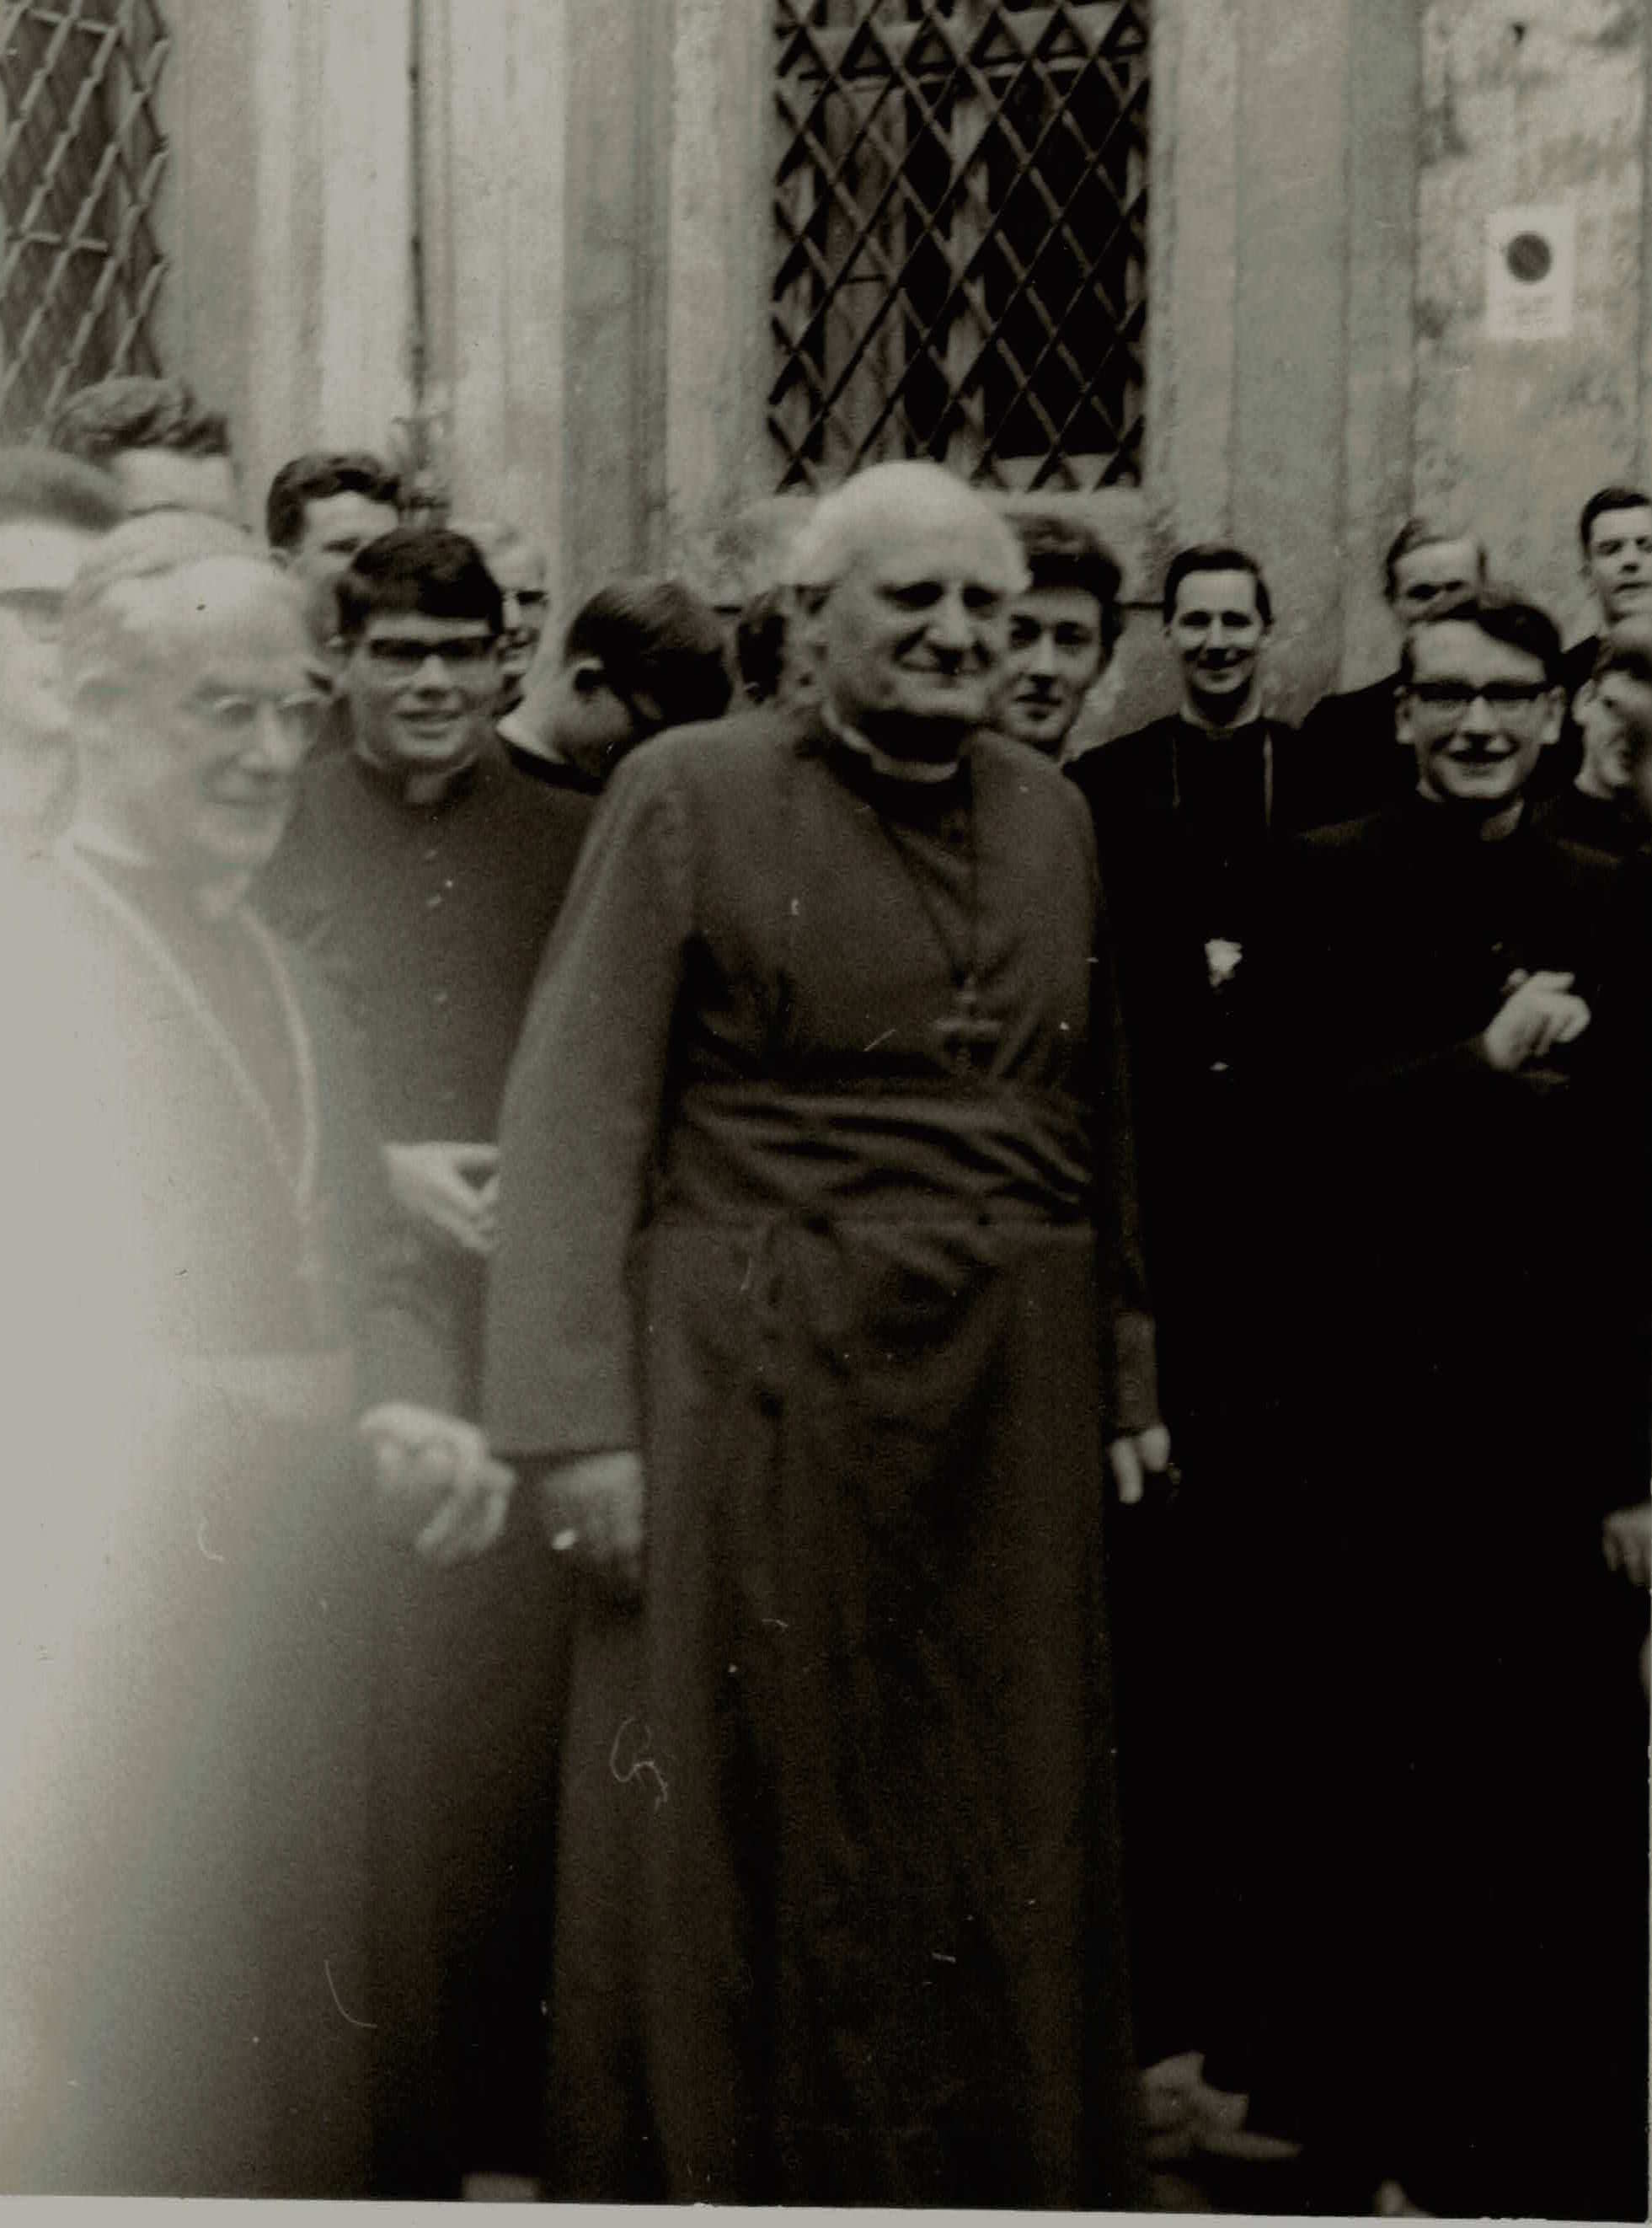 Archbishop Michael Ramsey arriving at the Venerable English College, 22 March 1966, escorted by Bishop Thomas Holland, of Salford.   Archivum Venerabilis Collegii Anglorum de Urbe (AVCAU),  Scritture  87/14